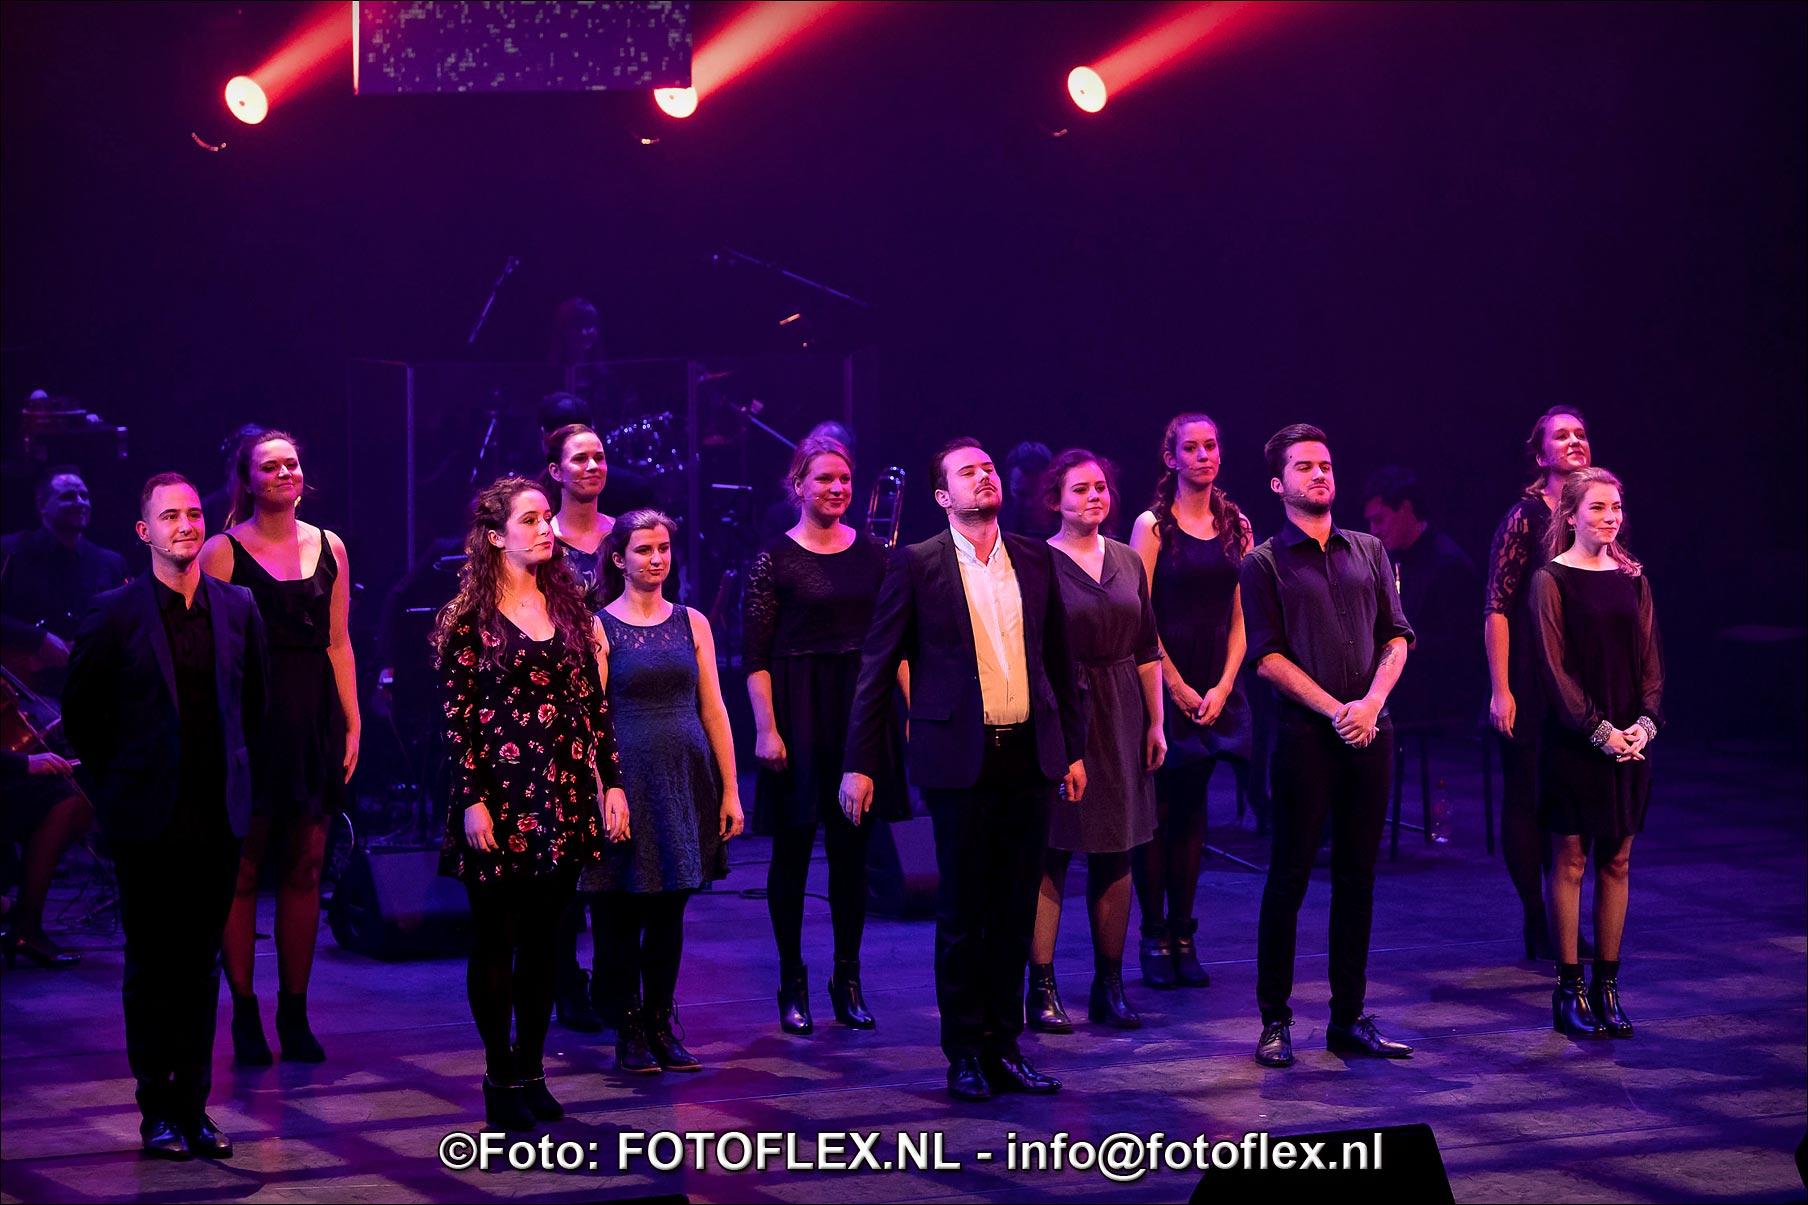 0623-CopyrightFOTOFLEX.NL07012020